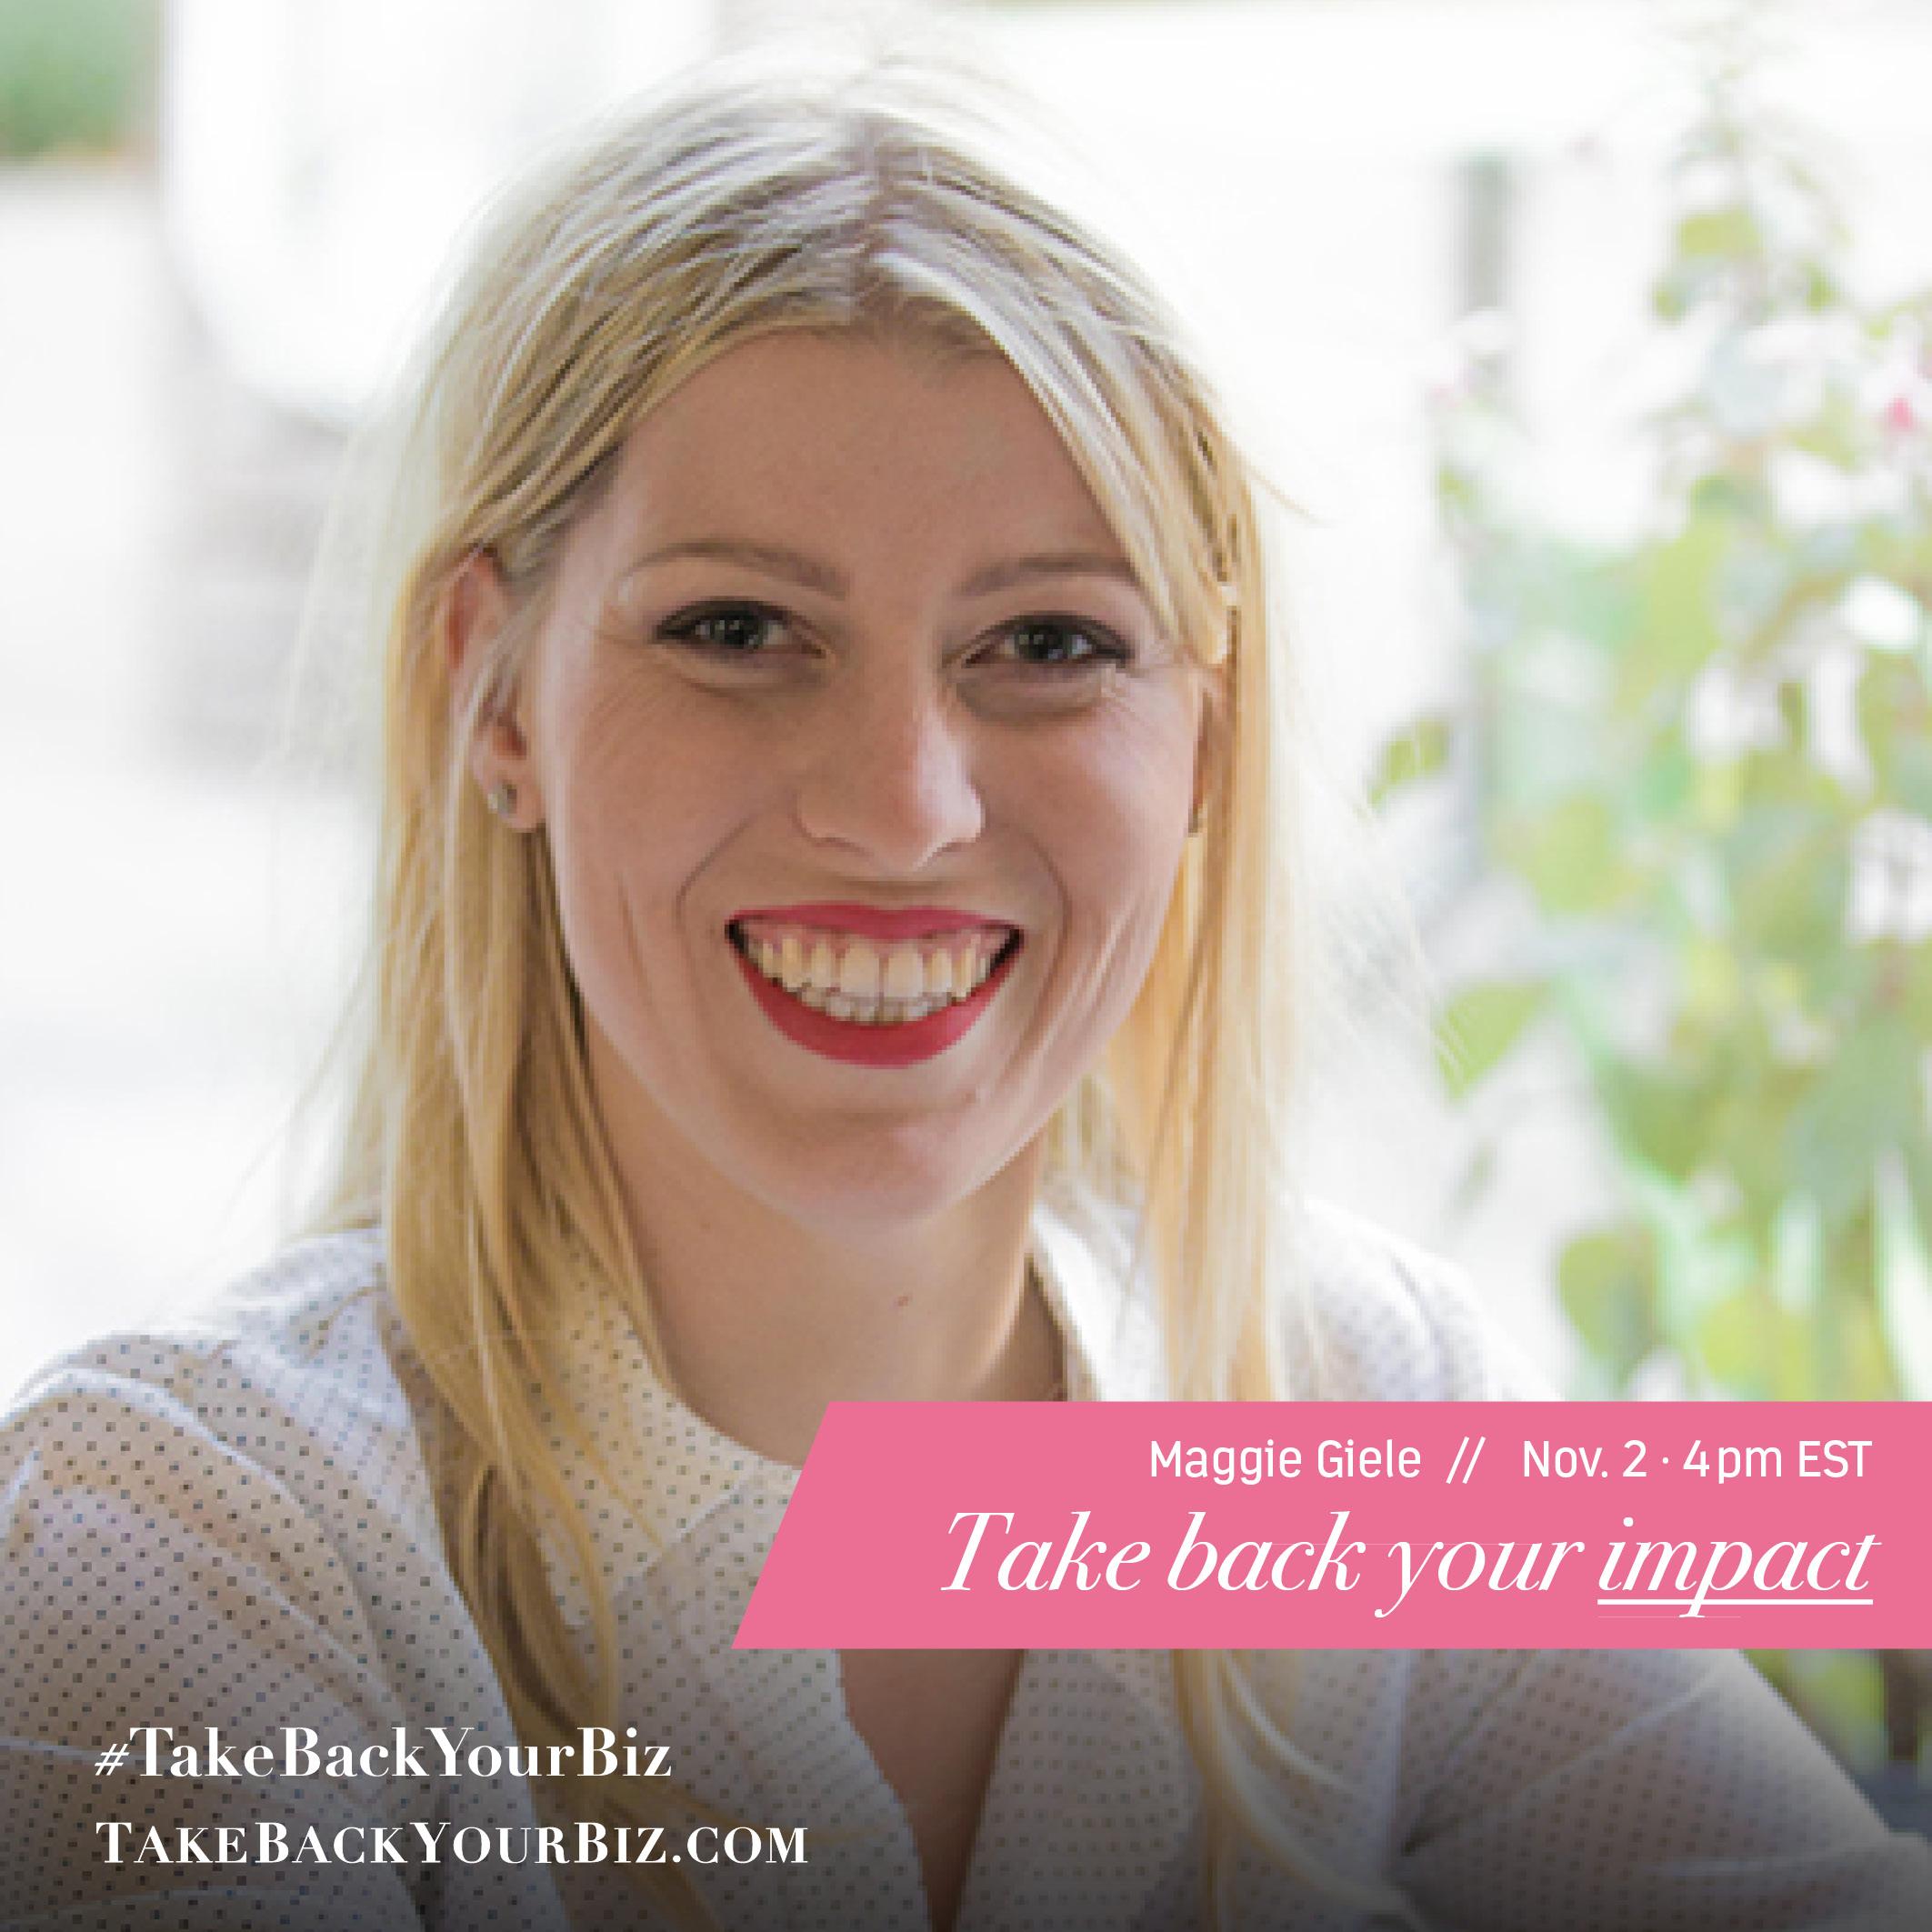 Take-Back-Your-Biz-Speakers-Maggie-Giele